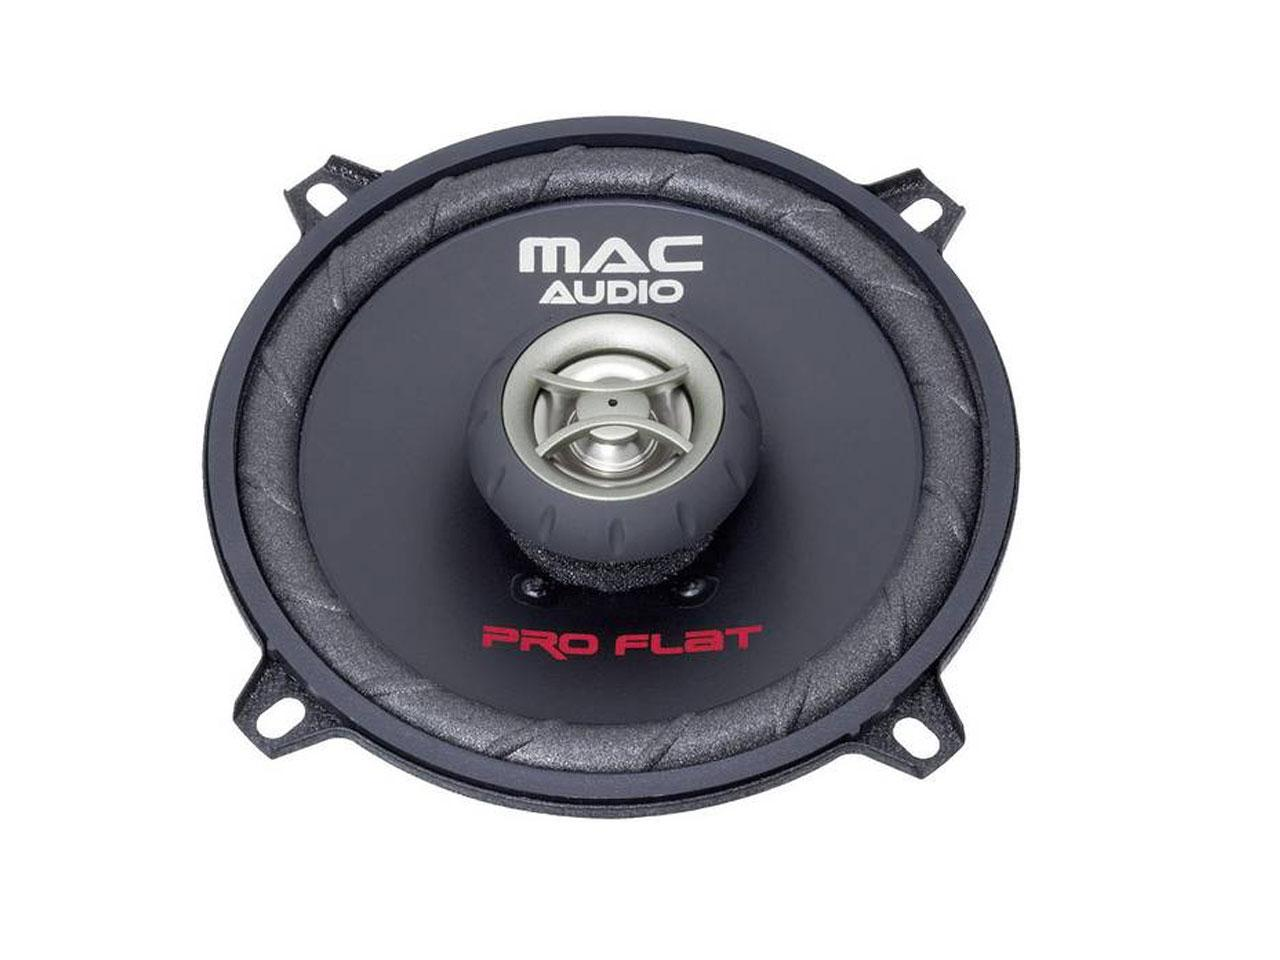 MAC AUDIO Pro Flat 13.2